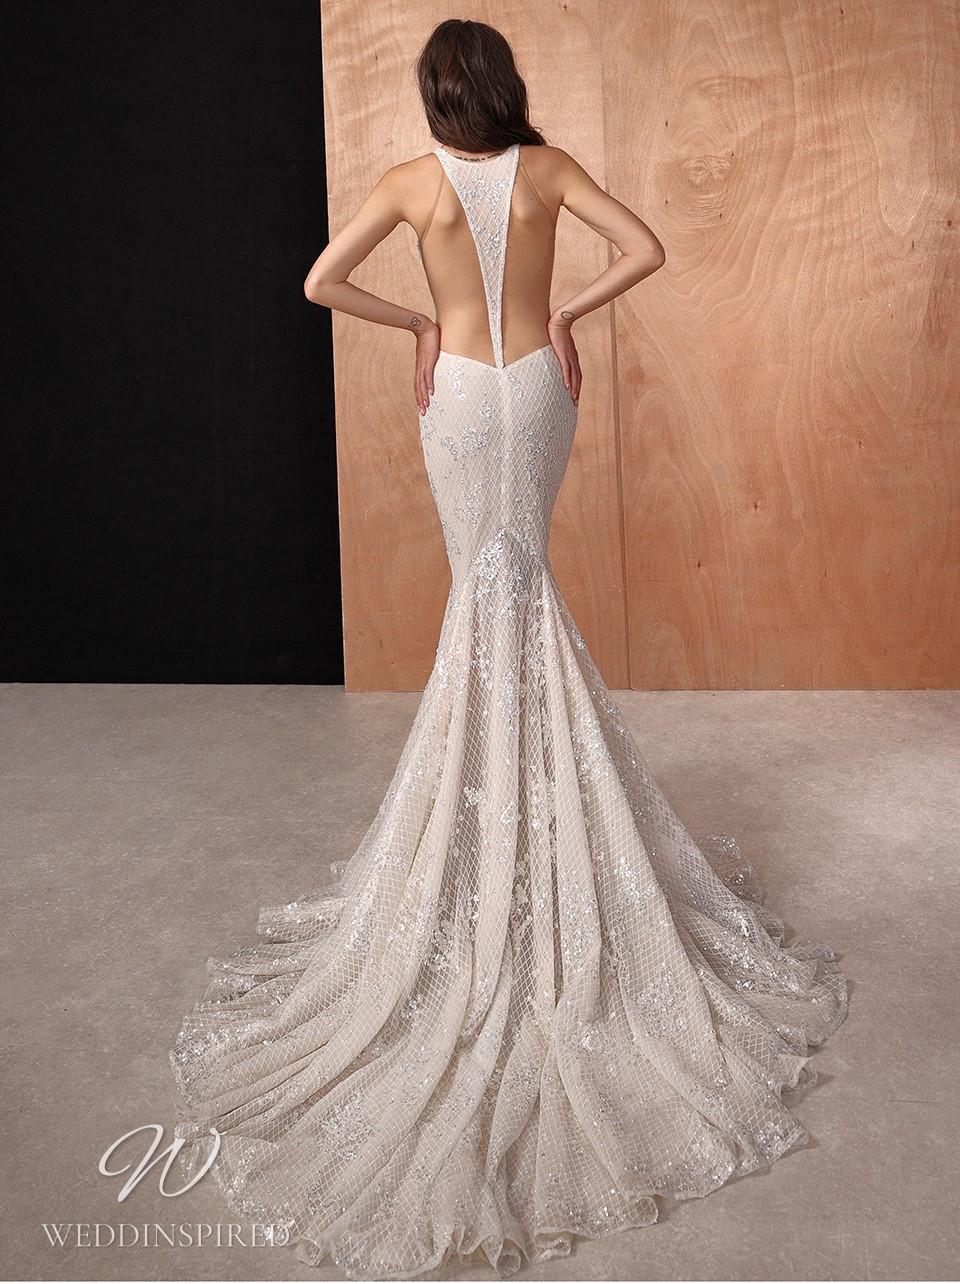 A Galia Lahav 2022 sparkly strapless mermaid wedding dress with an open back